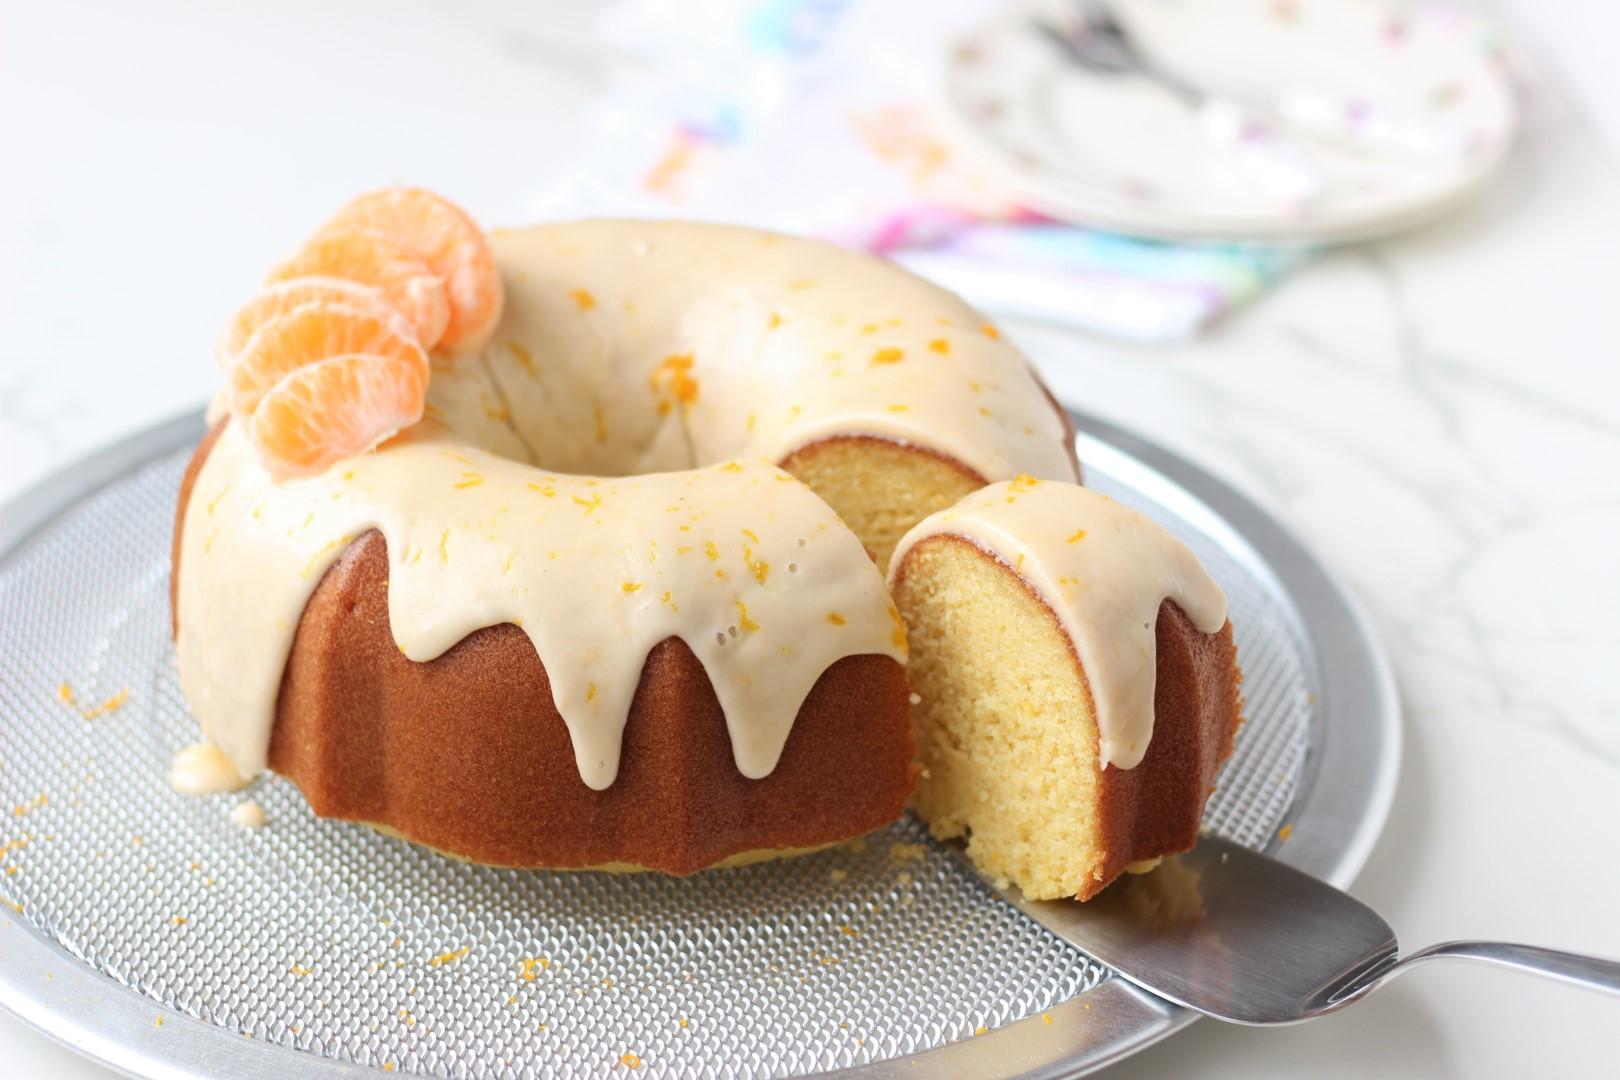 torta pound cake de mandarinas, torta, merienda, tea time, recetas de cocina, cocinar con essen, cacerolas essen, savarín essen, torta fácil